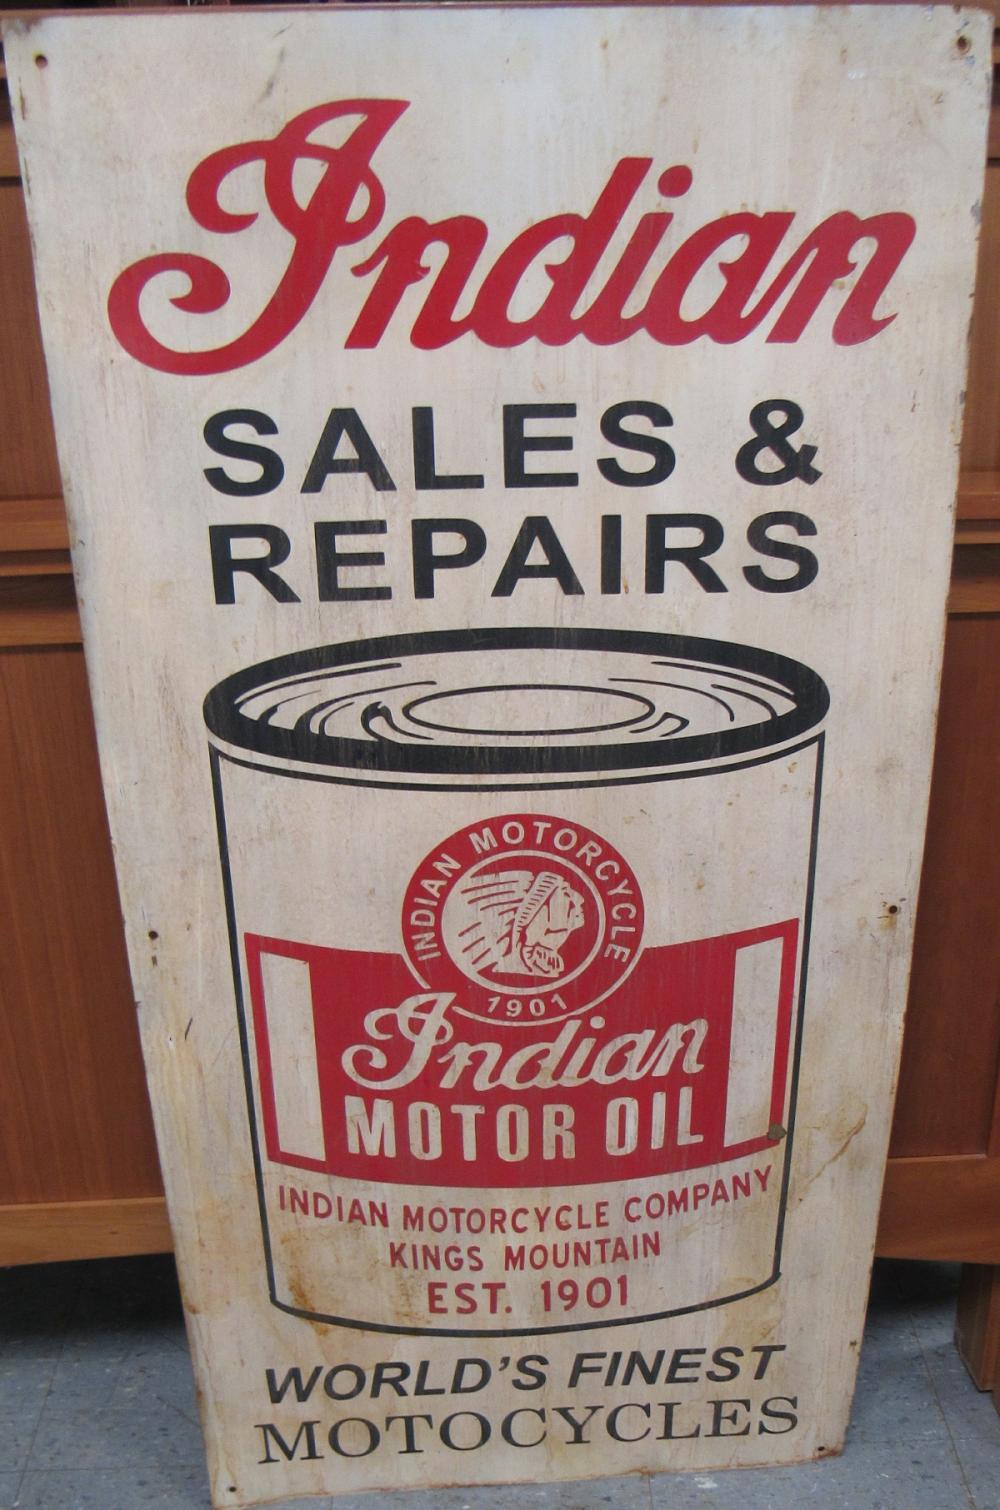 RARE Original Vintage Indian Motorcycle Sales & Repairs Sign, 48 x 24, EC